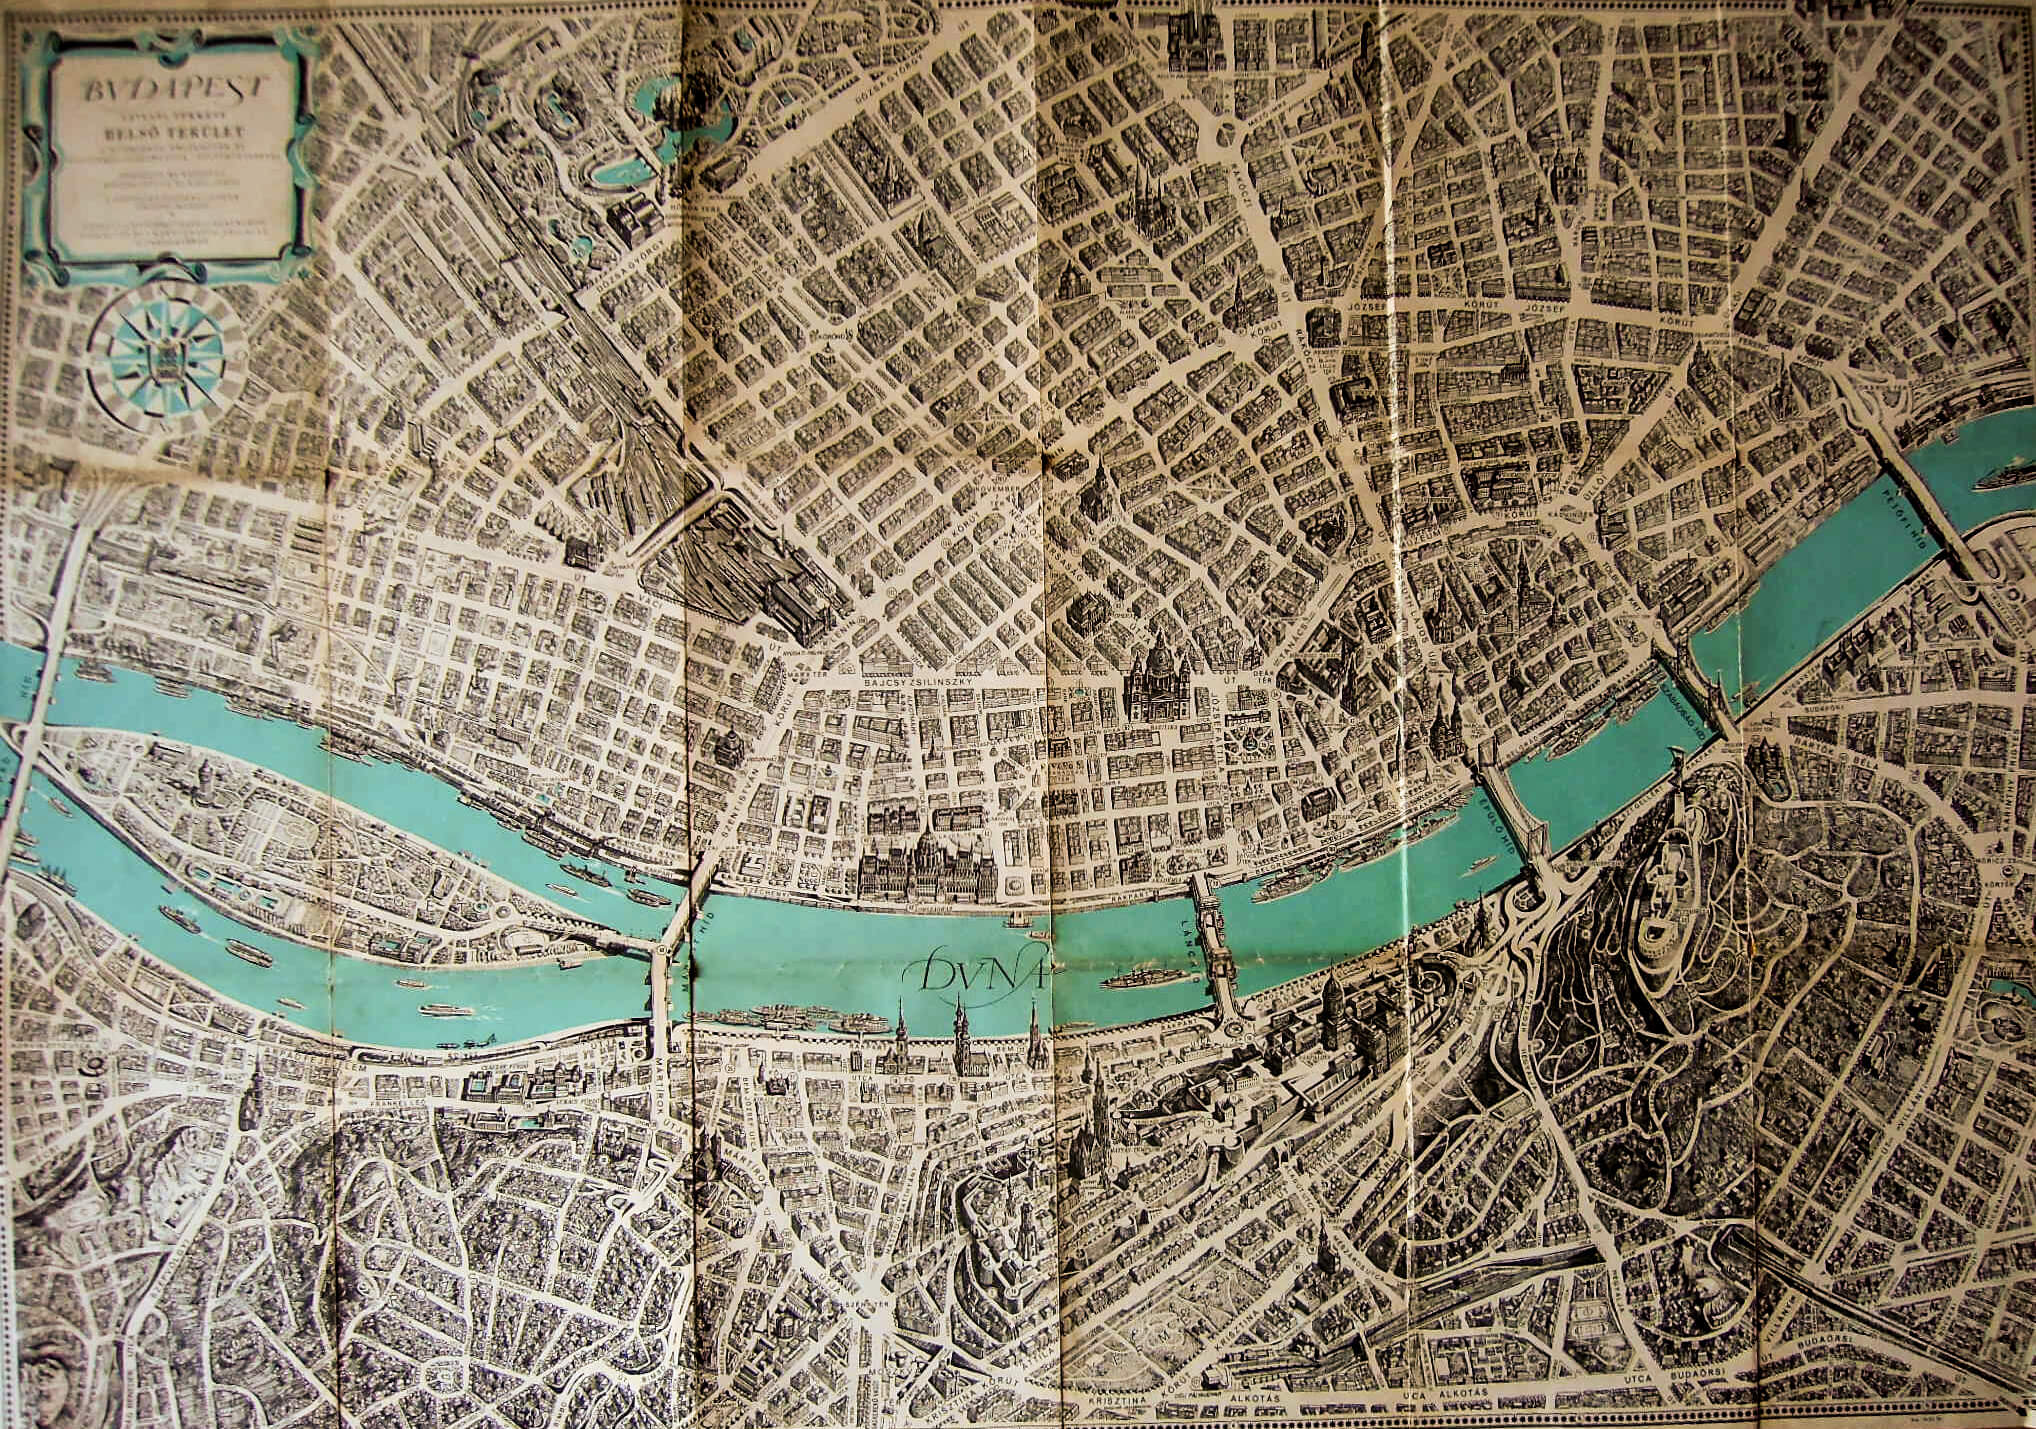 Budapest Panoráma régi térkép 1963